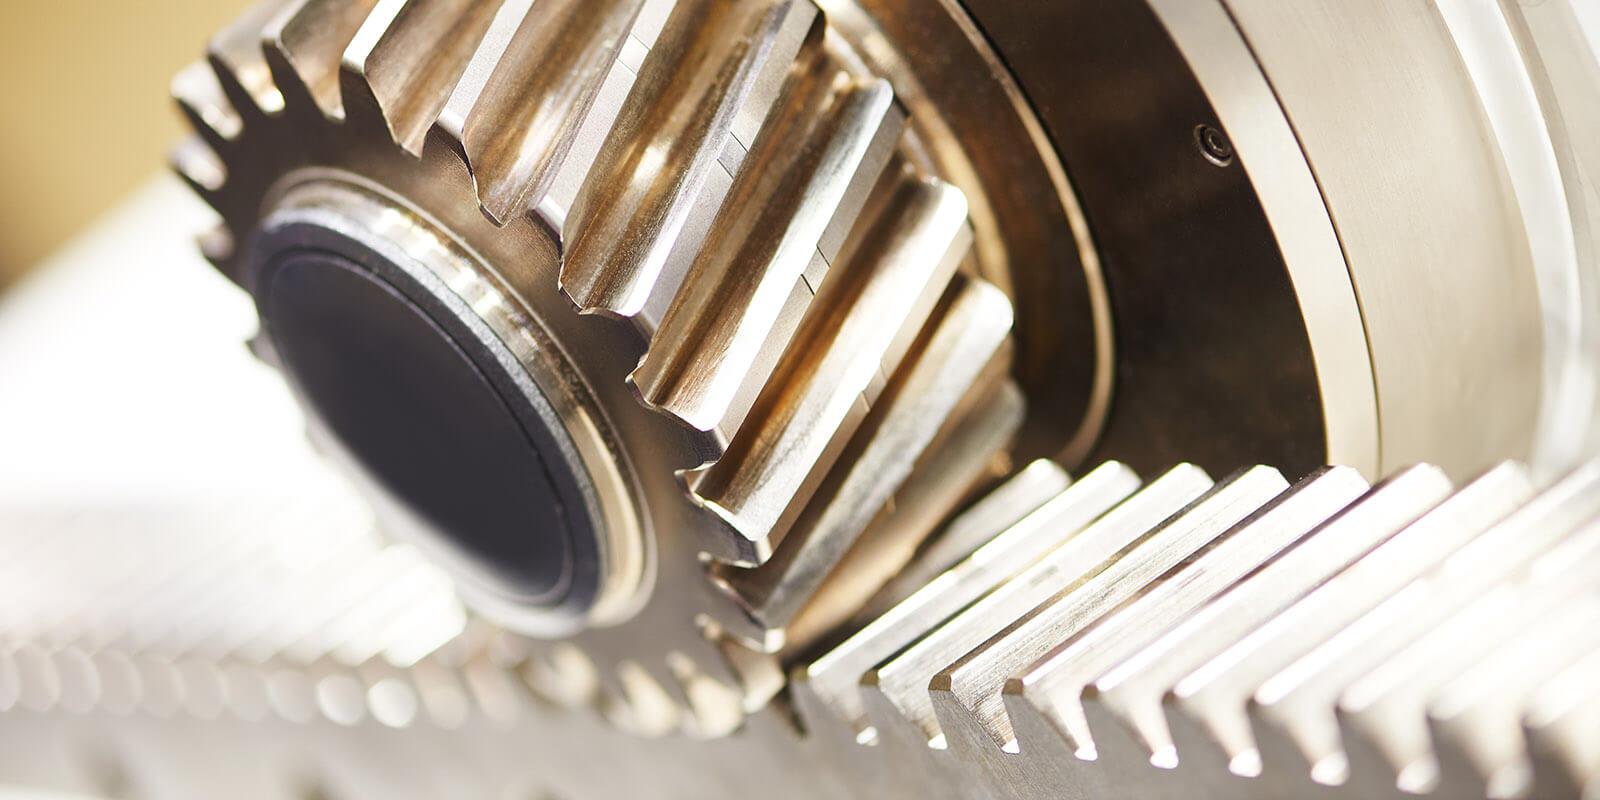 Metal cog tooth wheel and rack